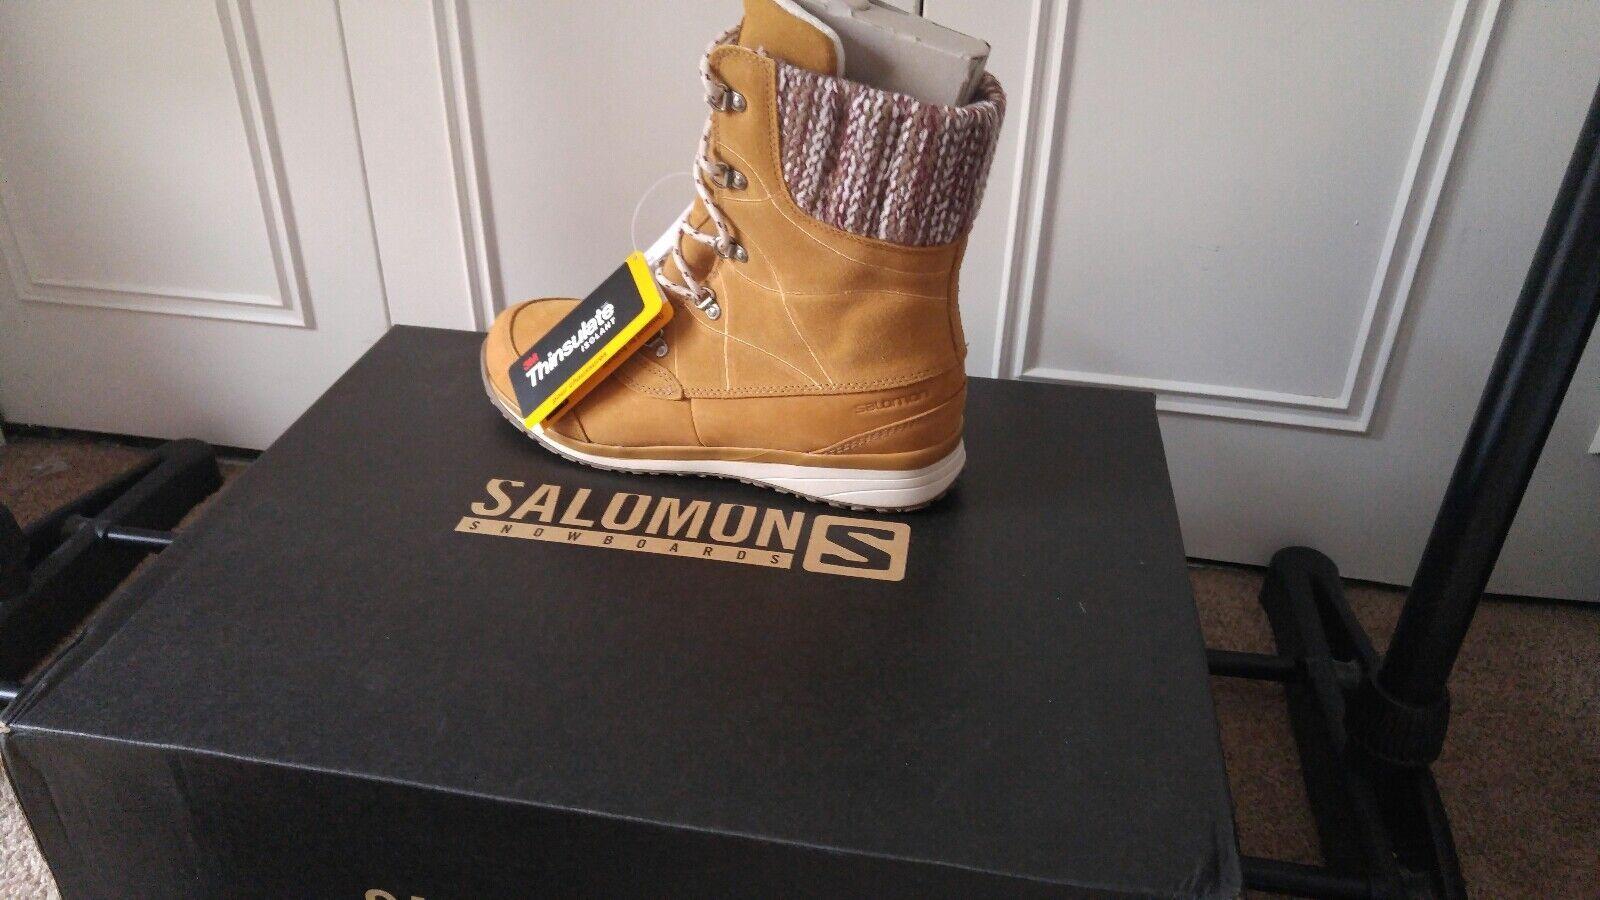 Salomon Womens Hime Mid Ltr Beige. Size 8.5 US